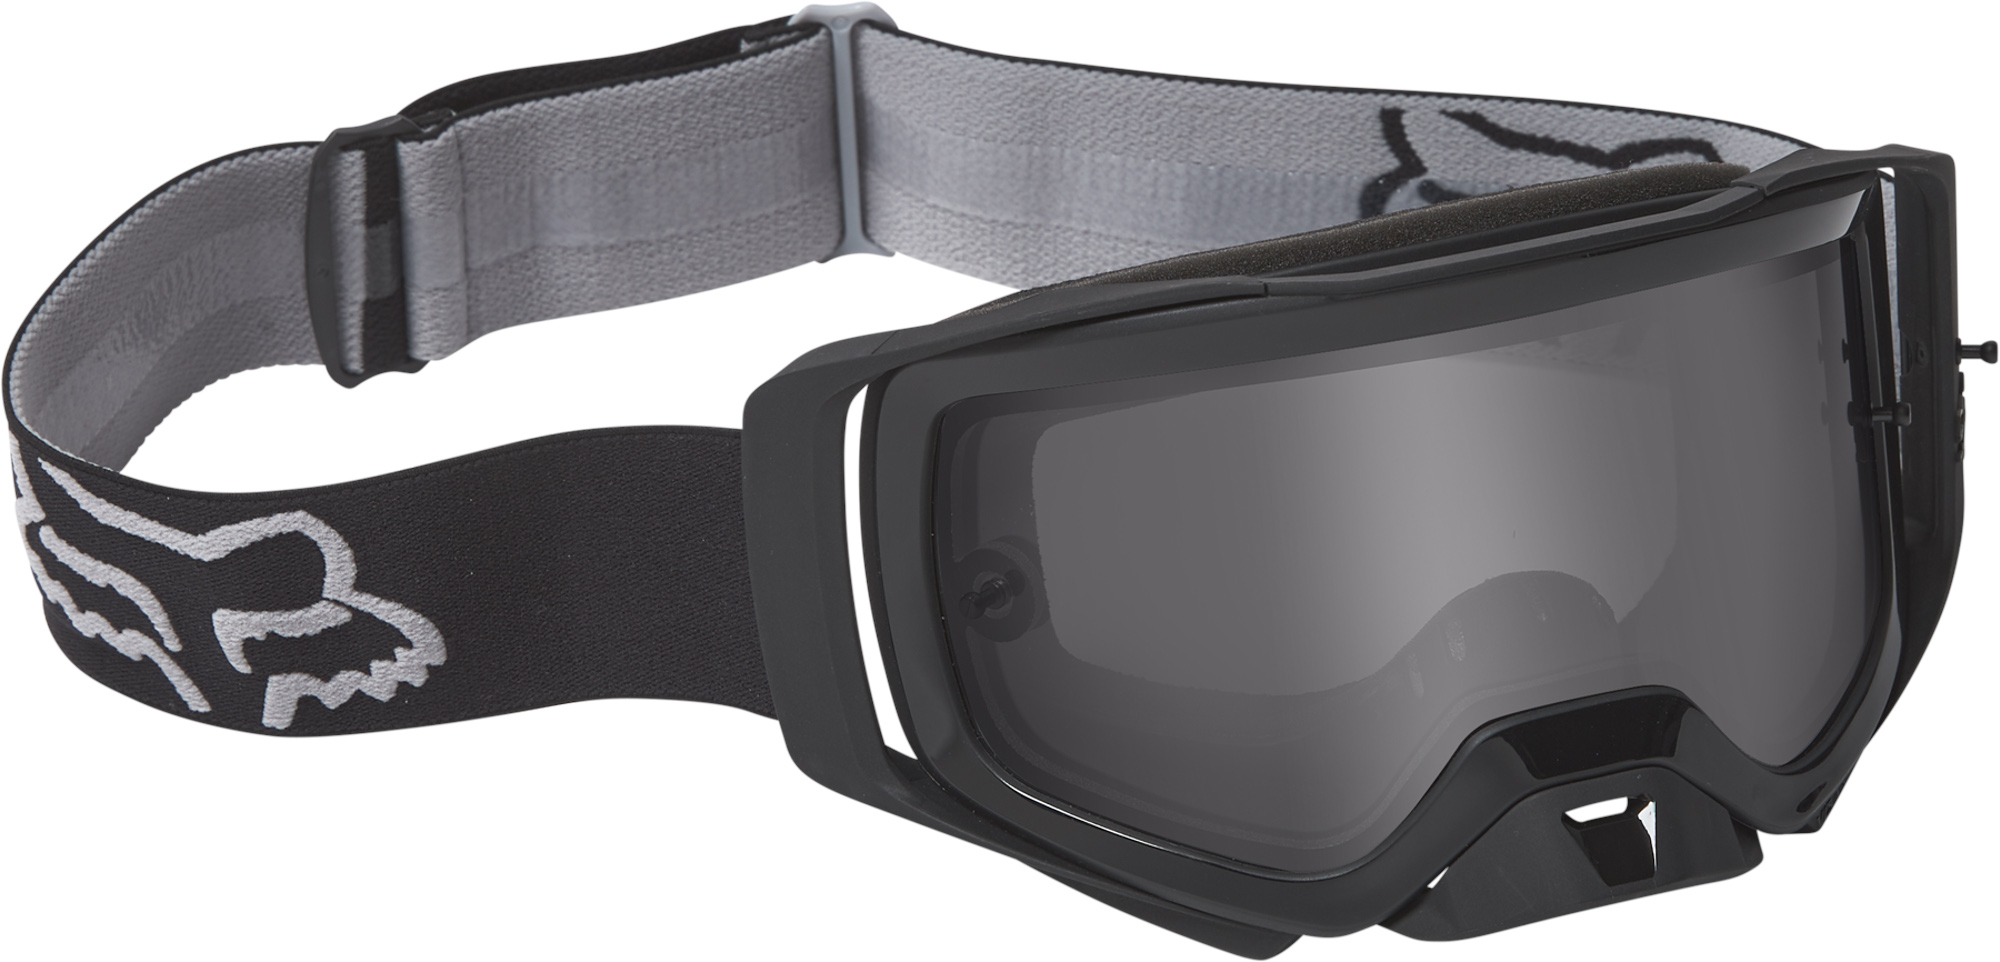 FOX Airspace X Stray Goggle - OS, BLACK/GREY MX22